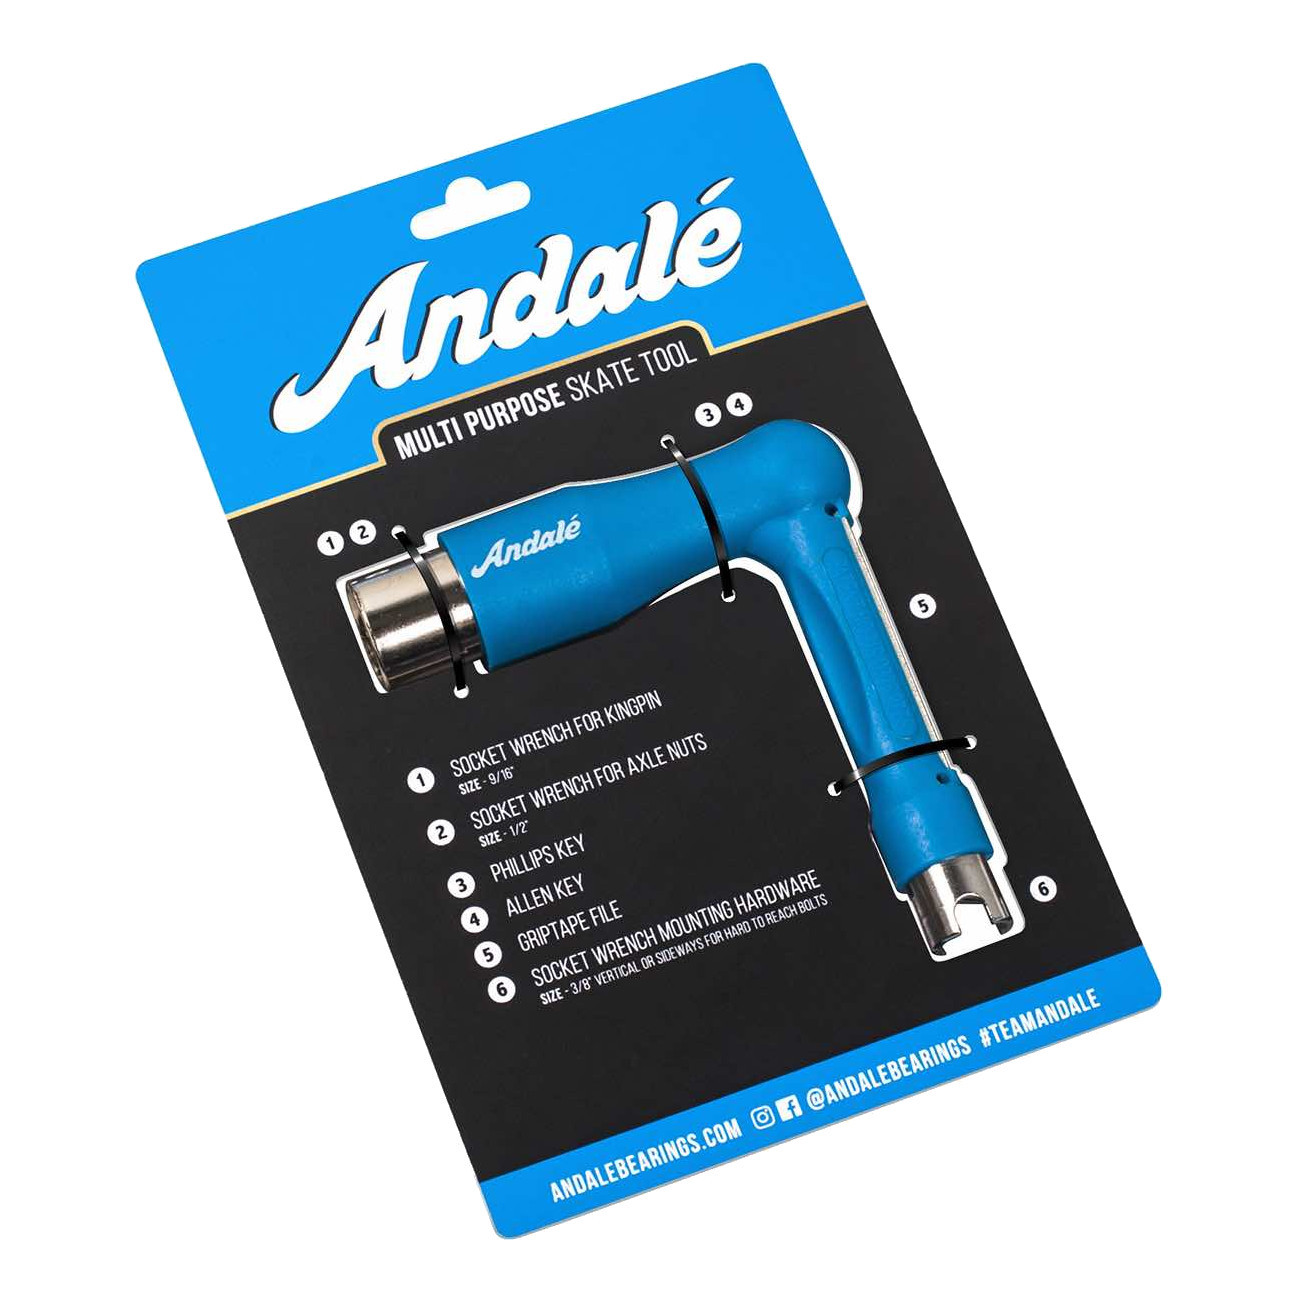 Ключ для скейта (скейт тул) ANDALE Skate Tool (Blue)